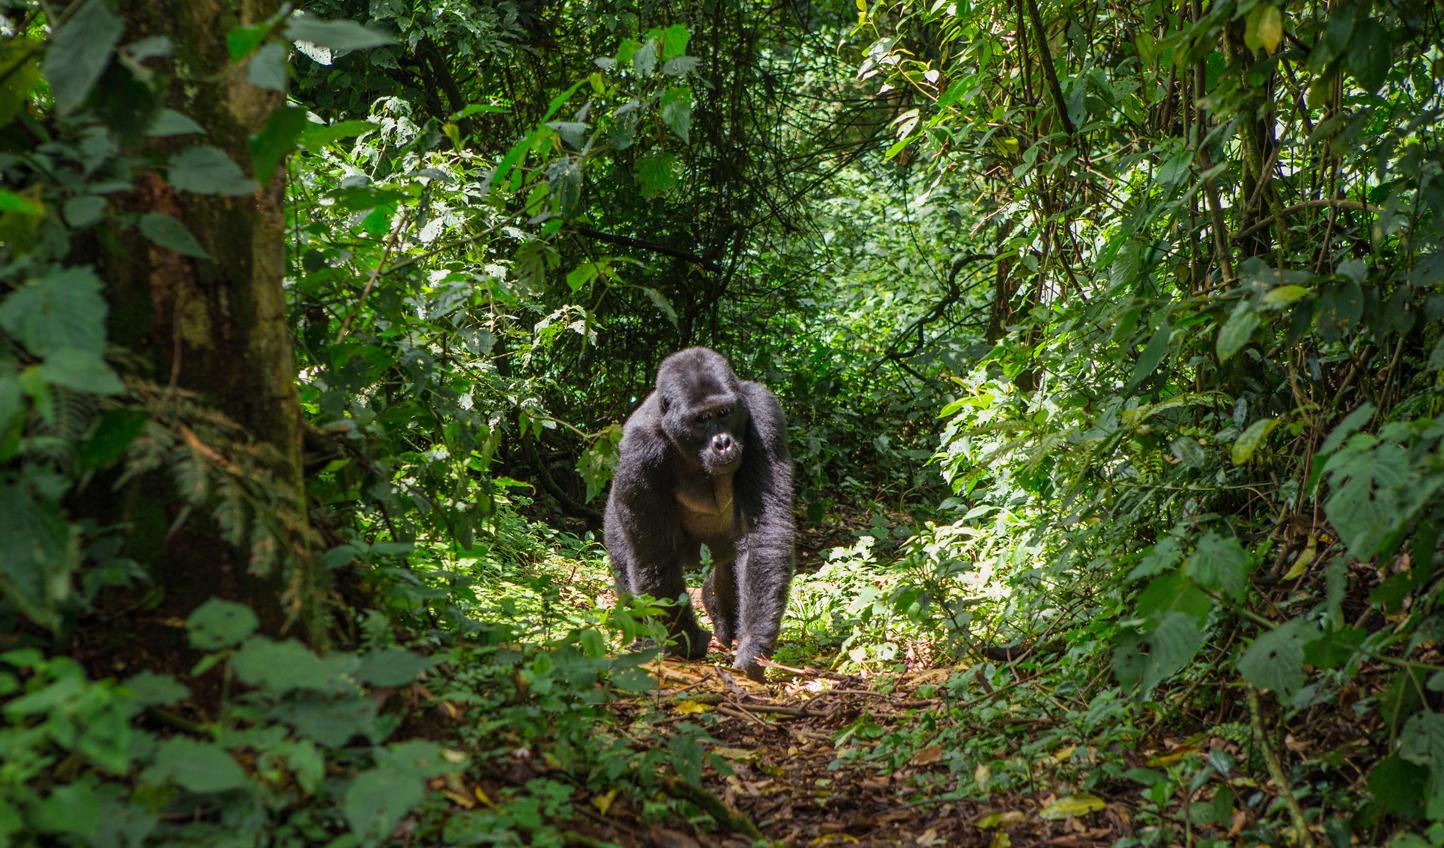 Experience gorilla tracking in Uganda